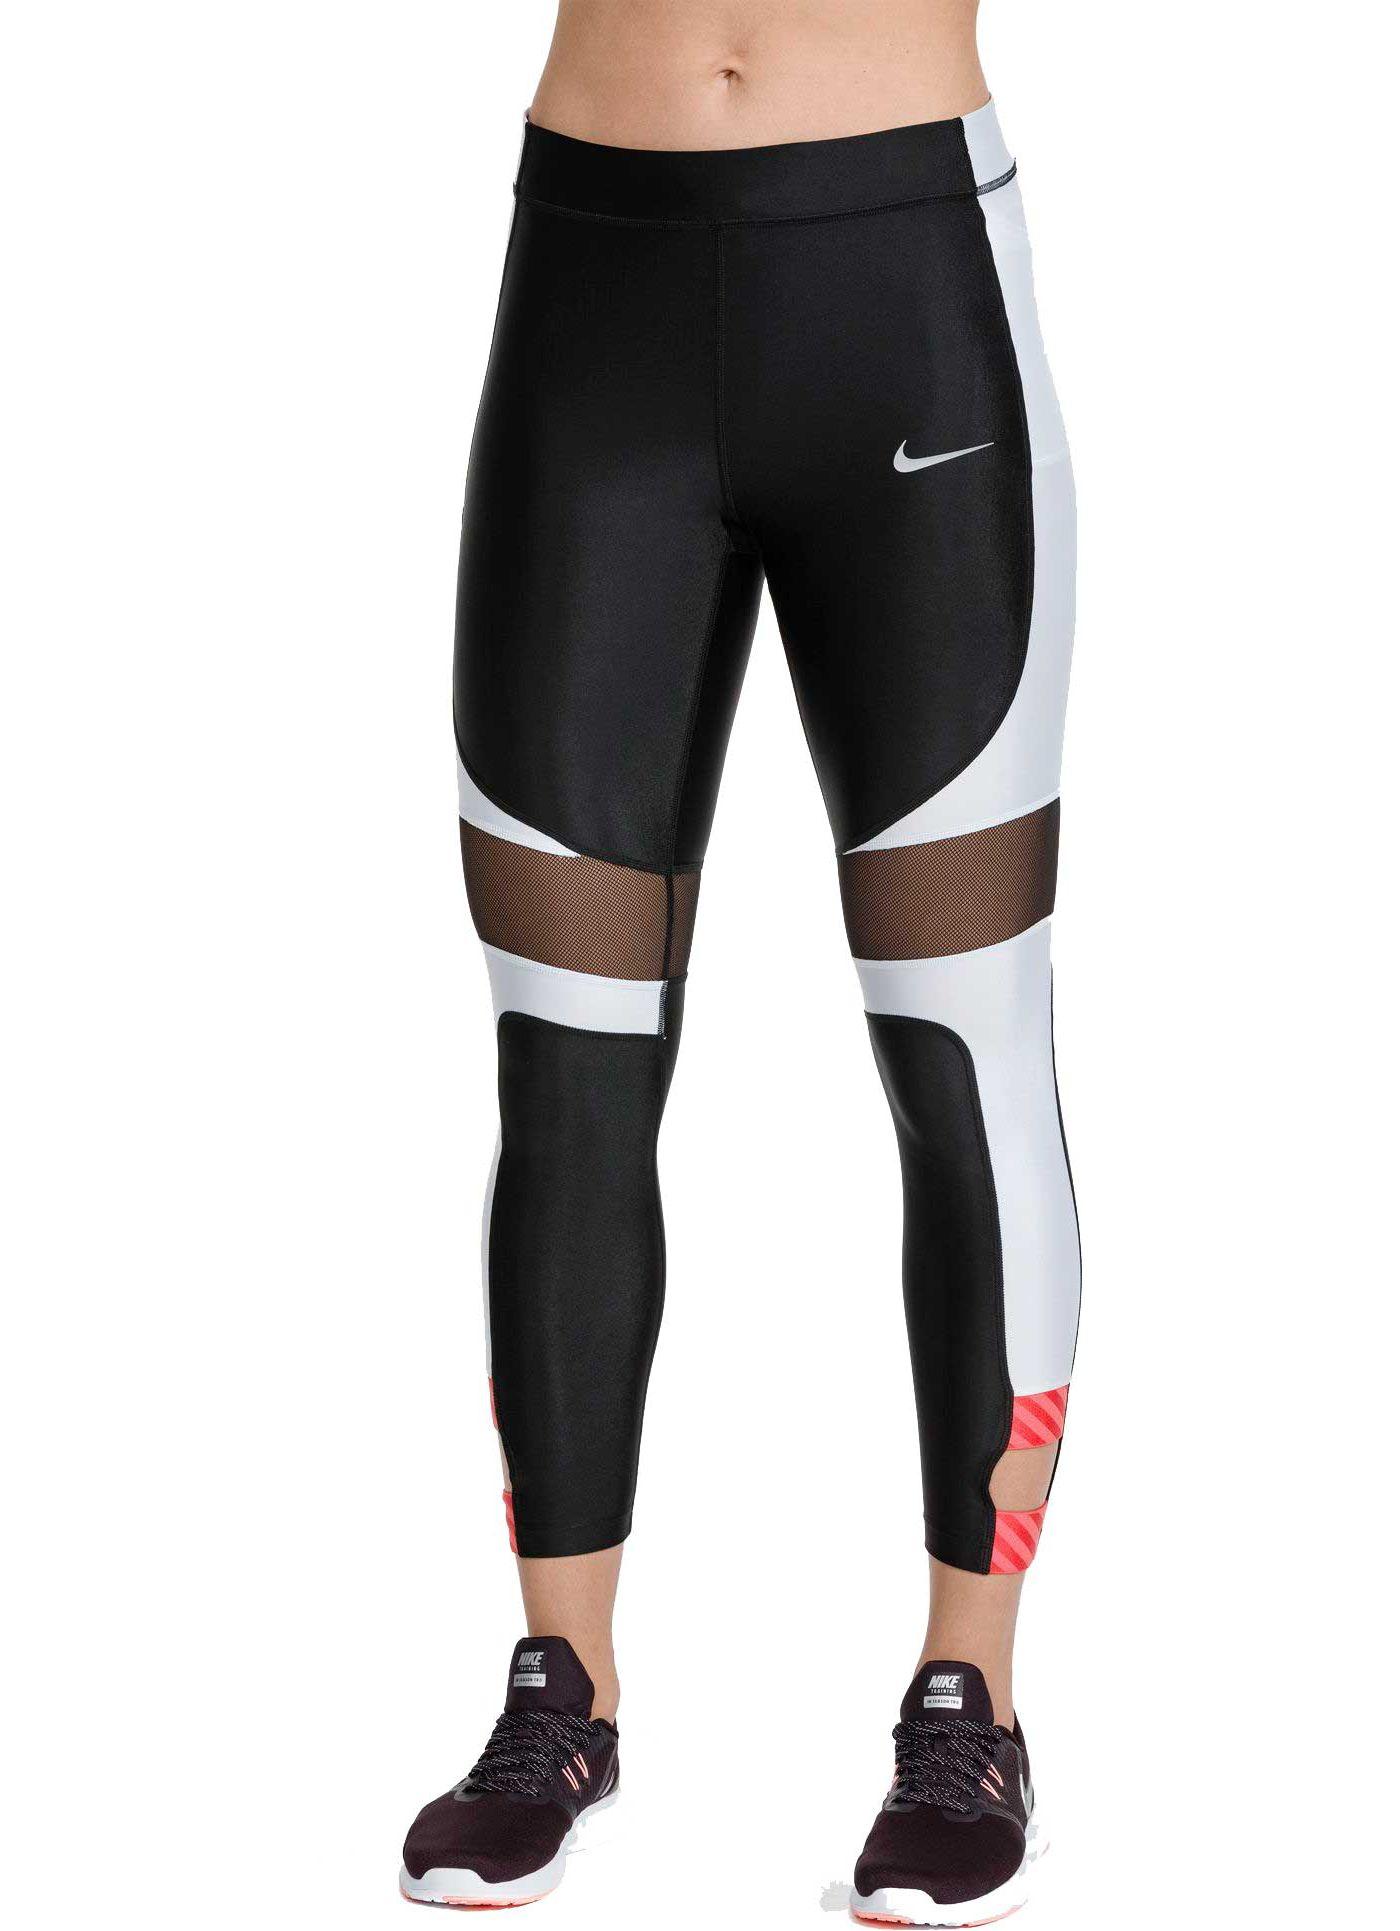 Nike Women's Speed 7/8 Running Tights